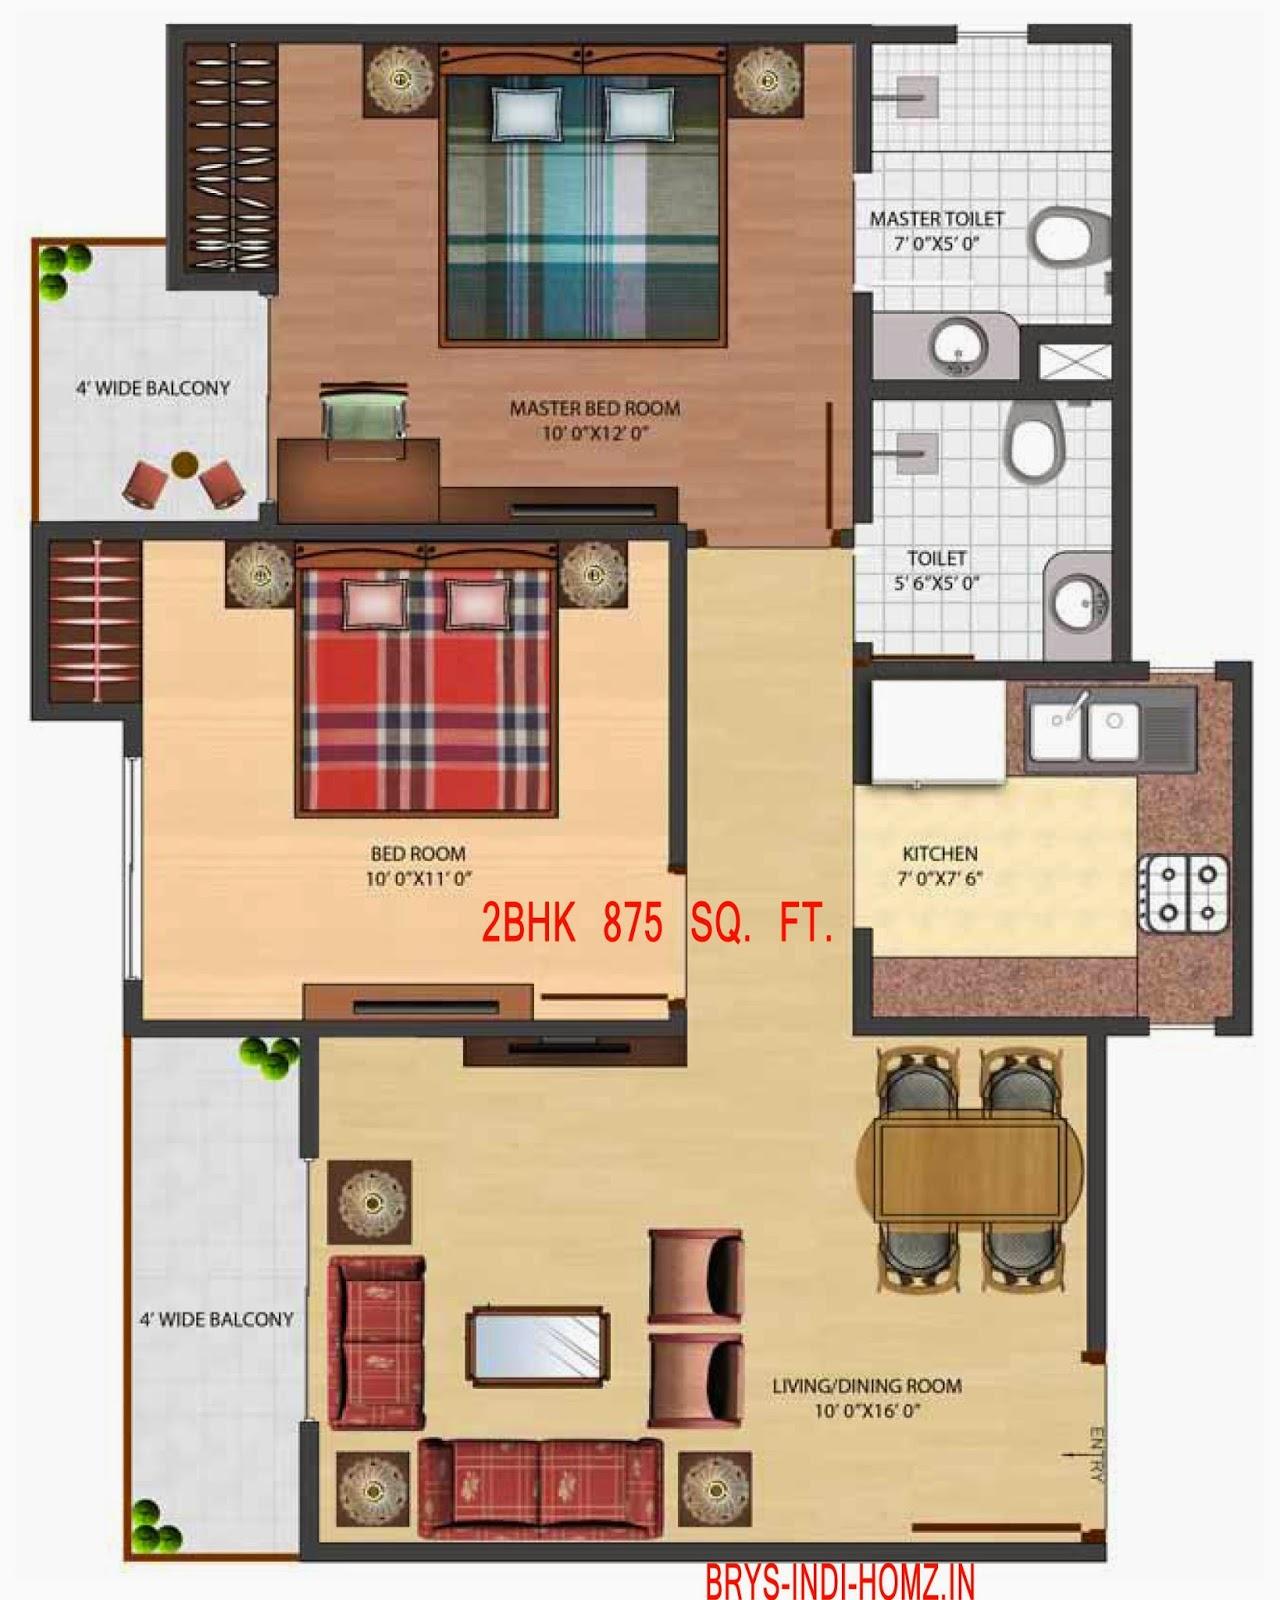 BRYS IndiHomz :: Floor Plans 2 BHK 875 Sq. Ft.